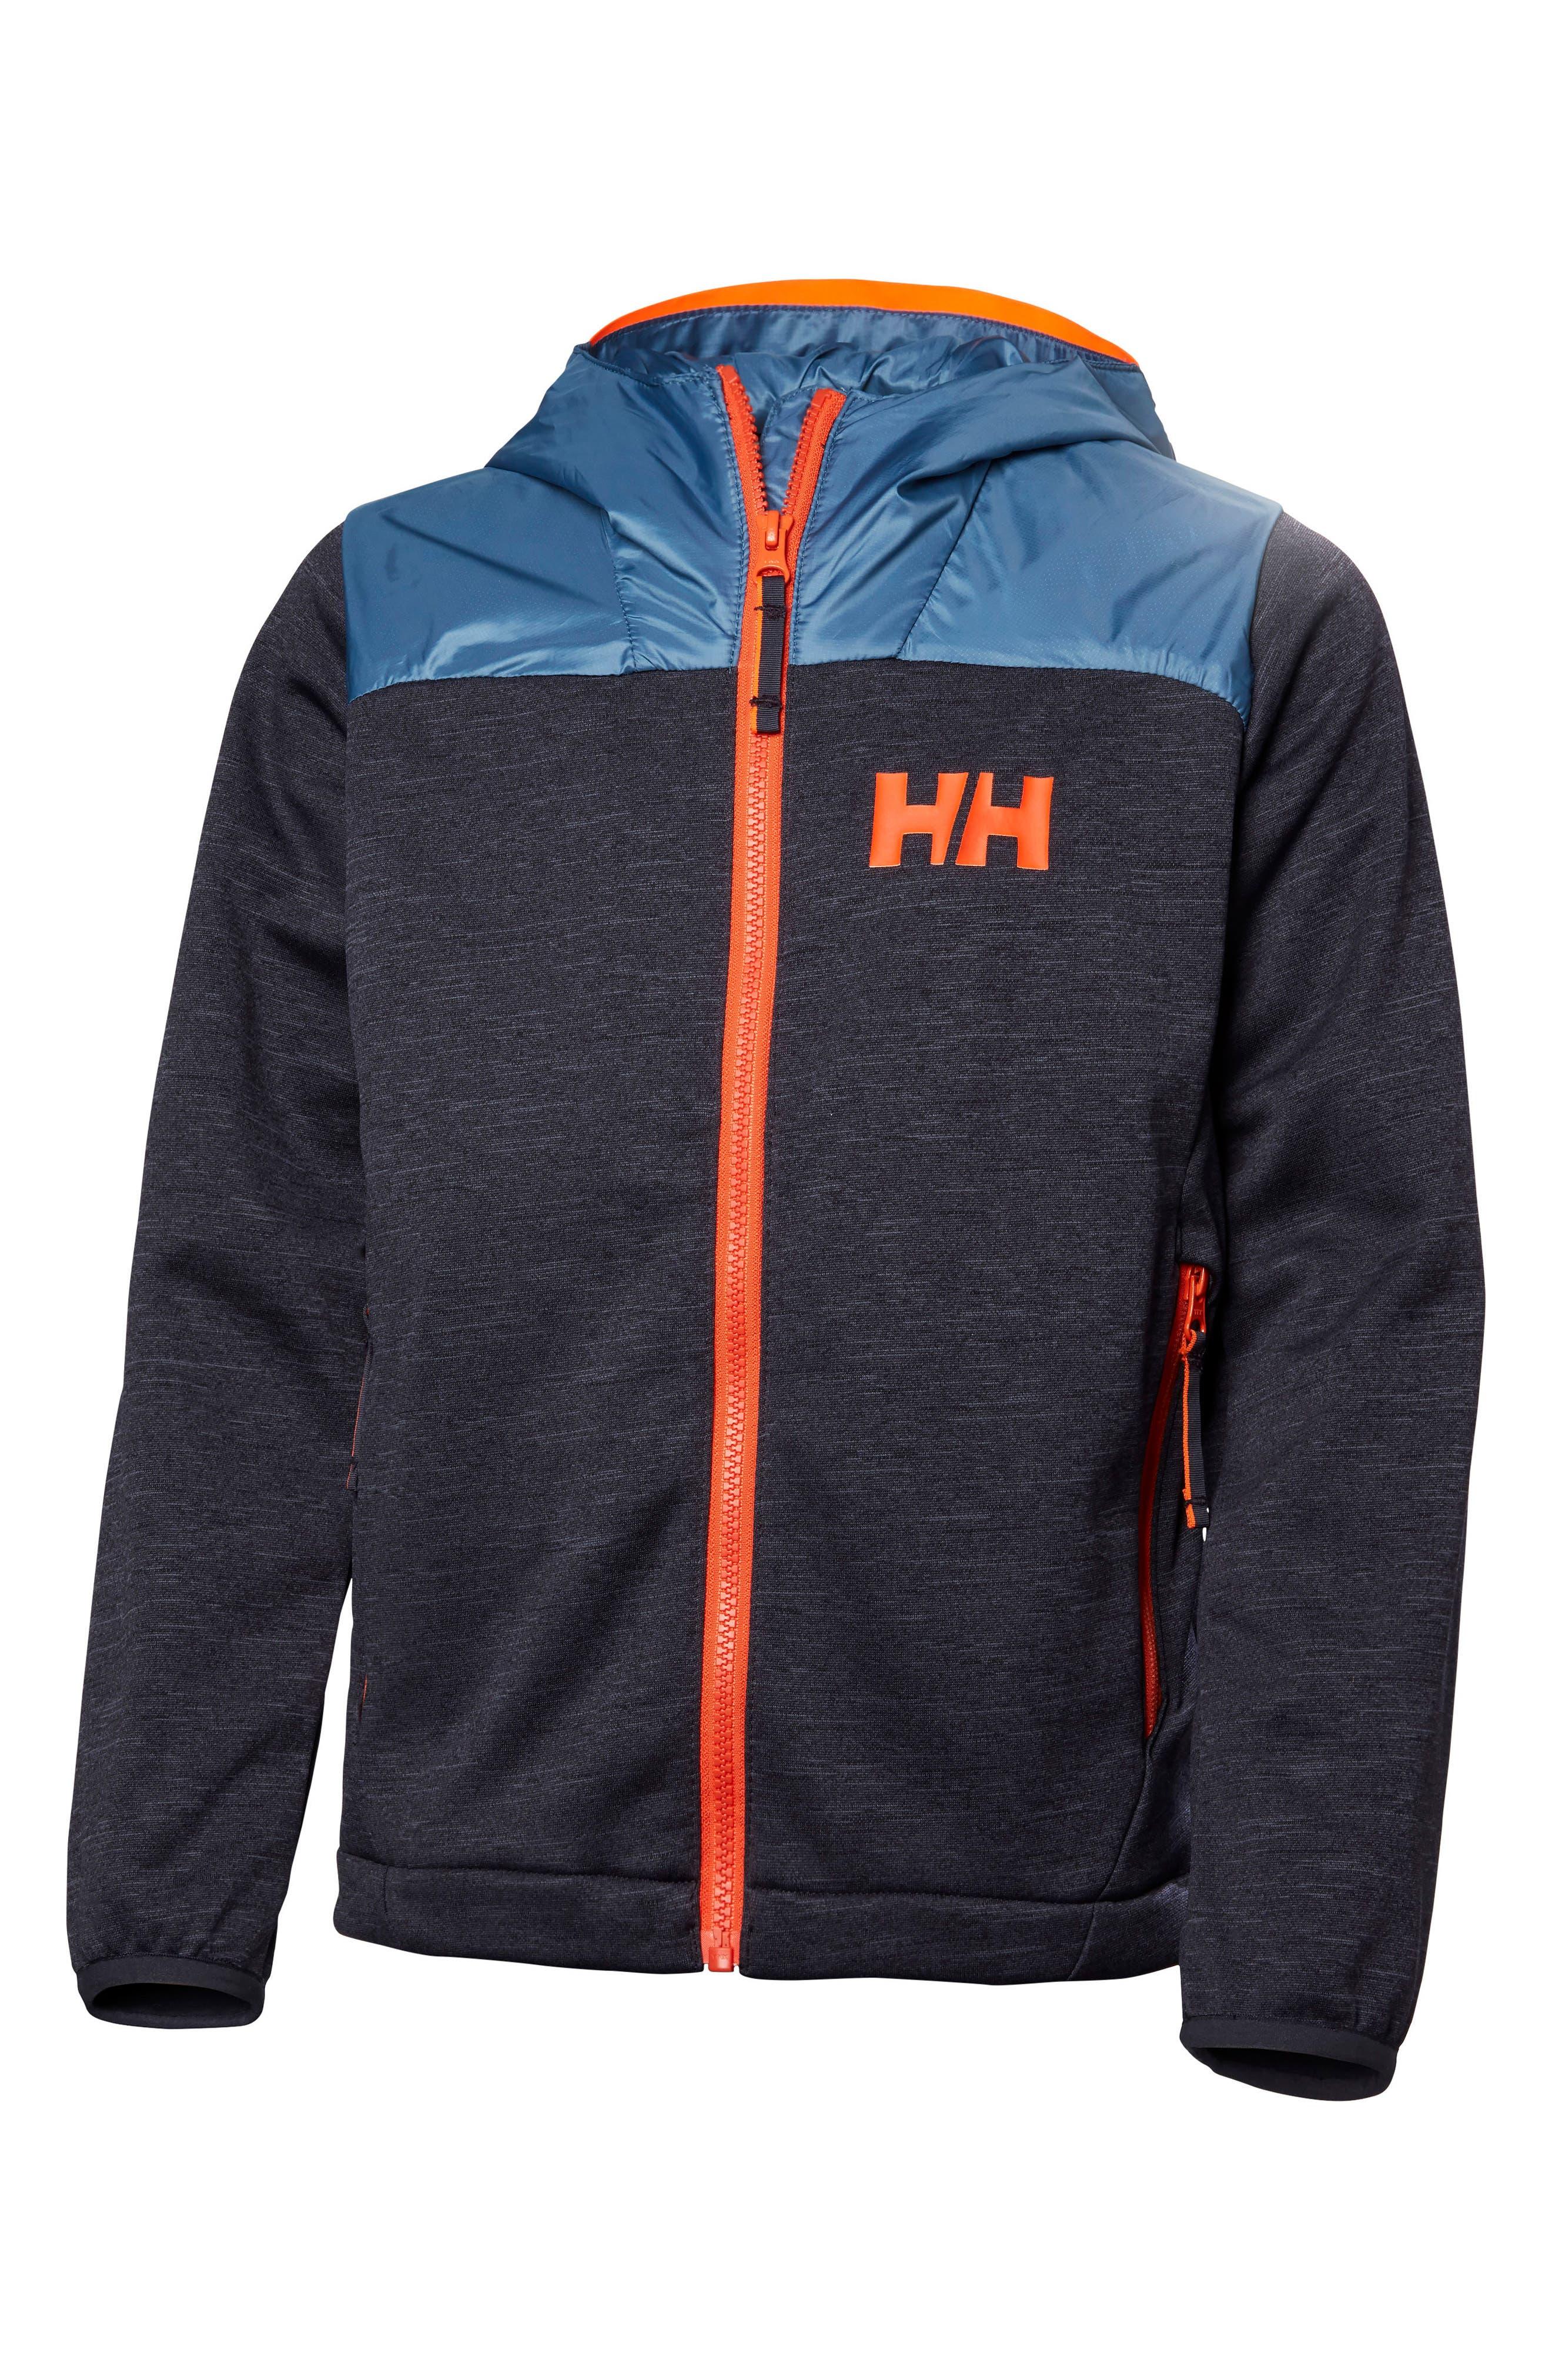 Hybrid Midlayer Jacket,                             Main thumbnail 1, color,                             404